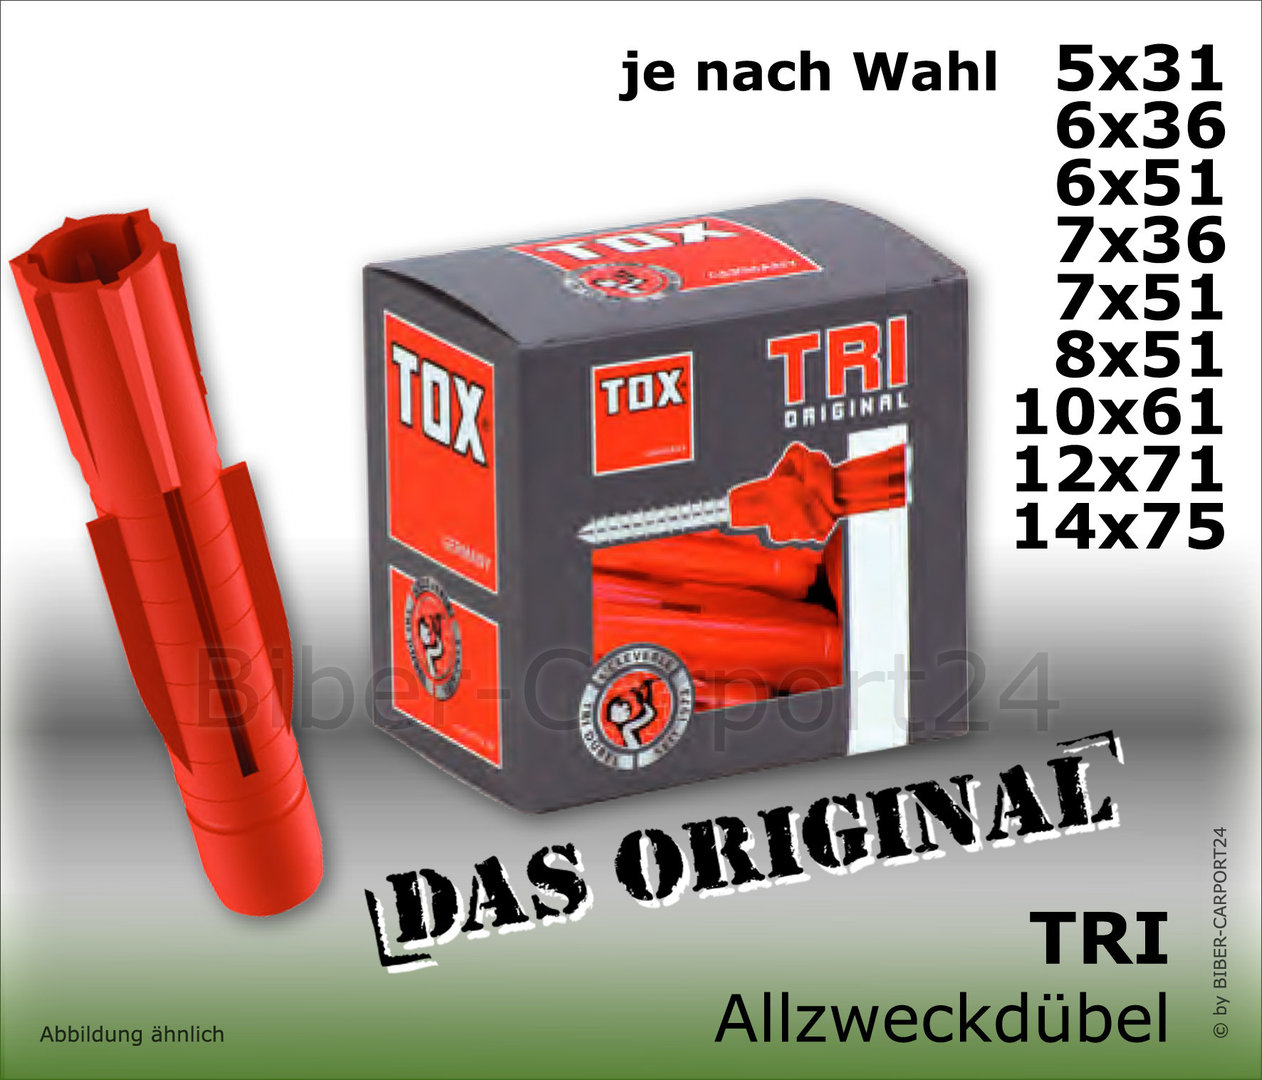 tox tri allzweckd bel verschiedene gr en made in germany. Black Bedroom Furniture Sets. Home Design Ideas